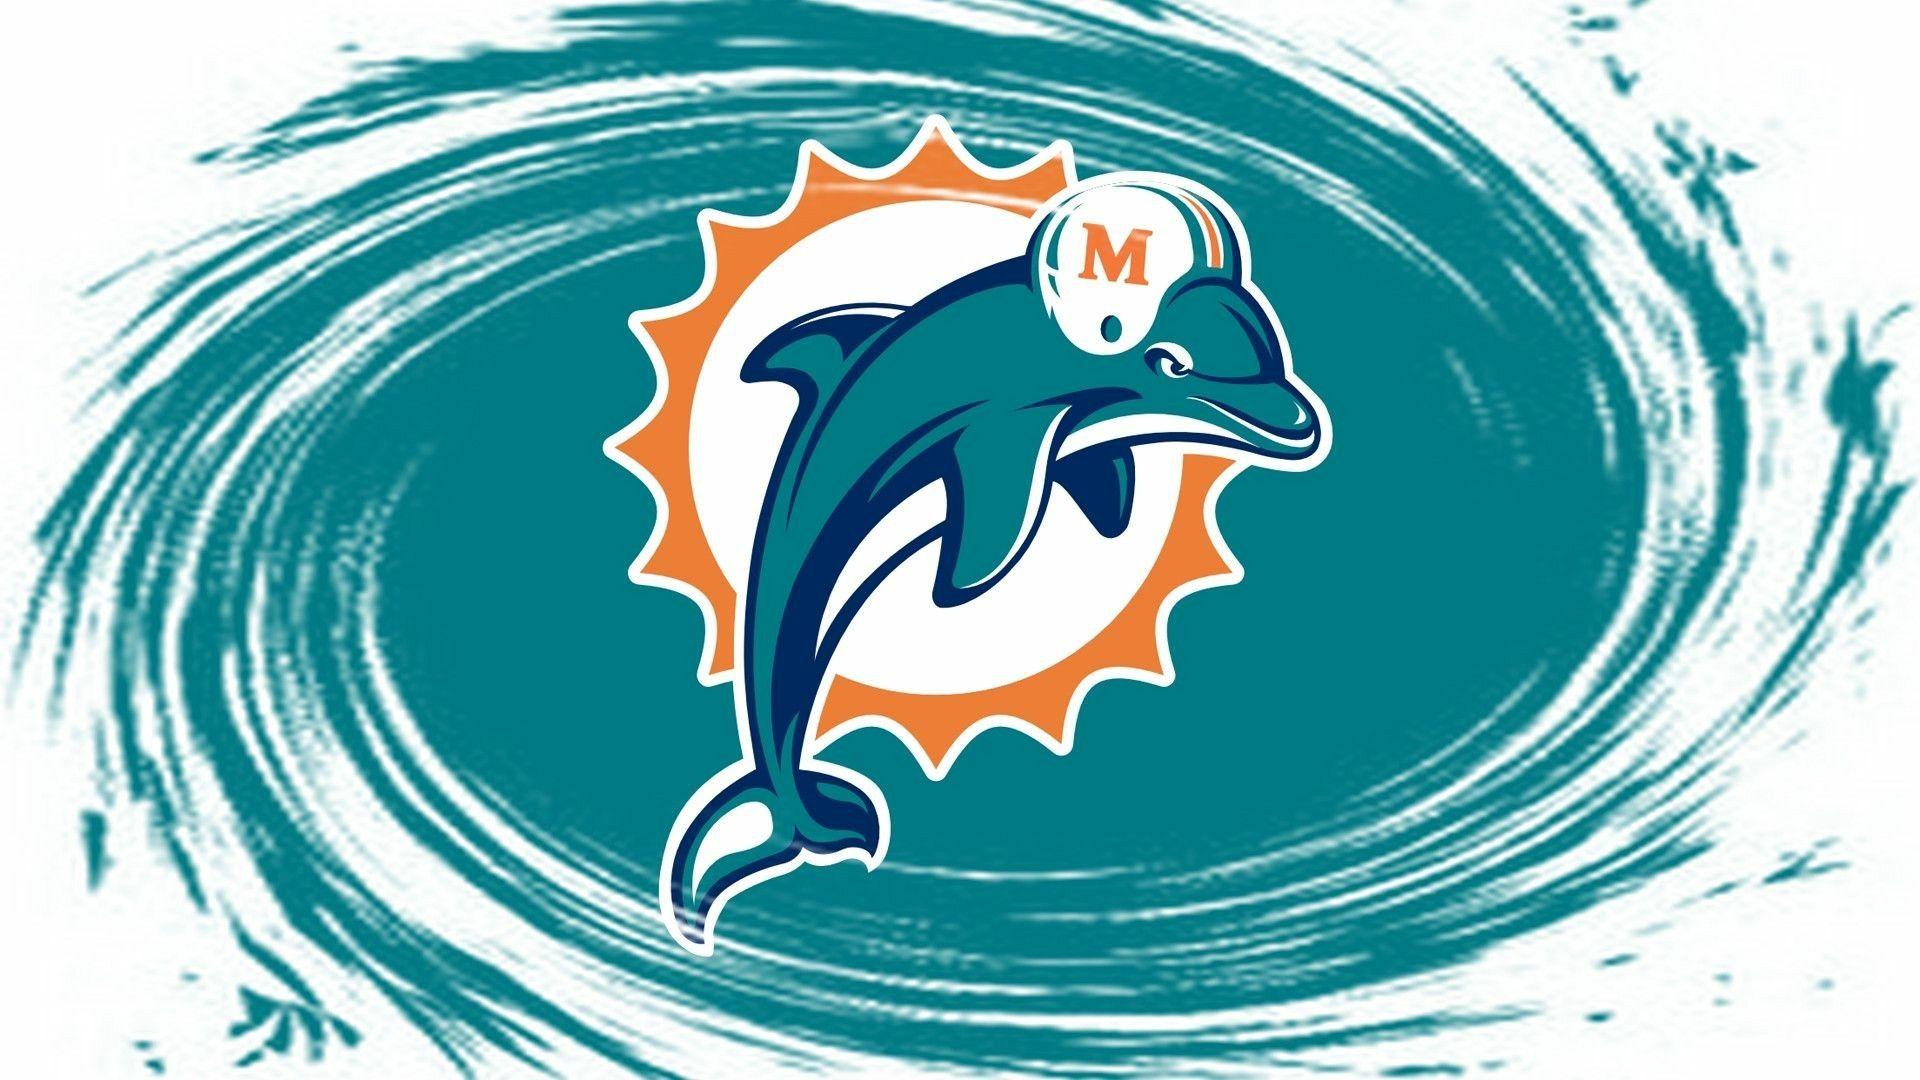 Miami Dolphins | Miami dolphins logo, Miami dolphins ...